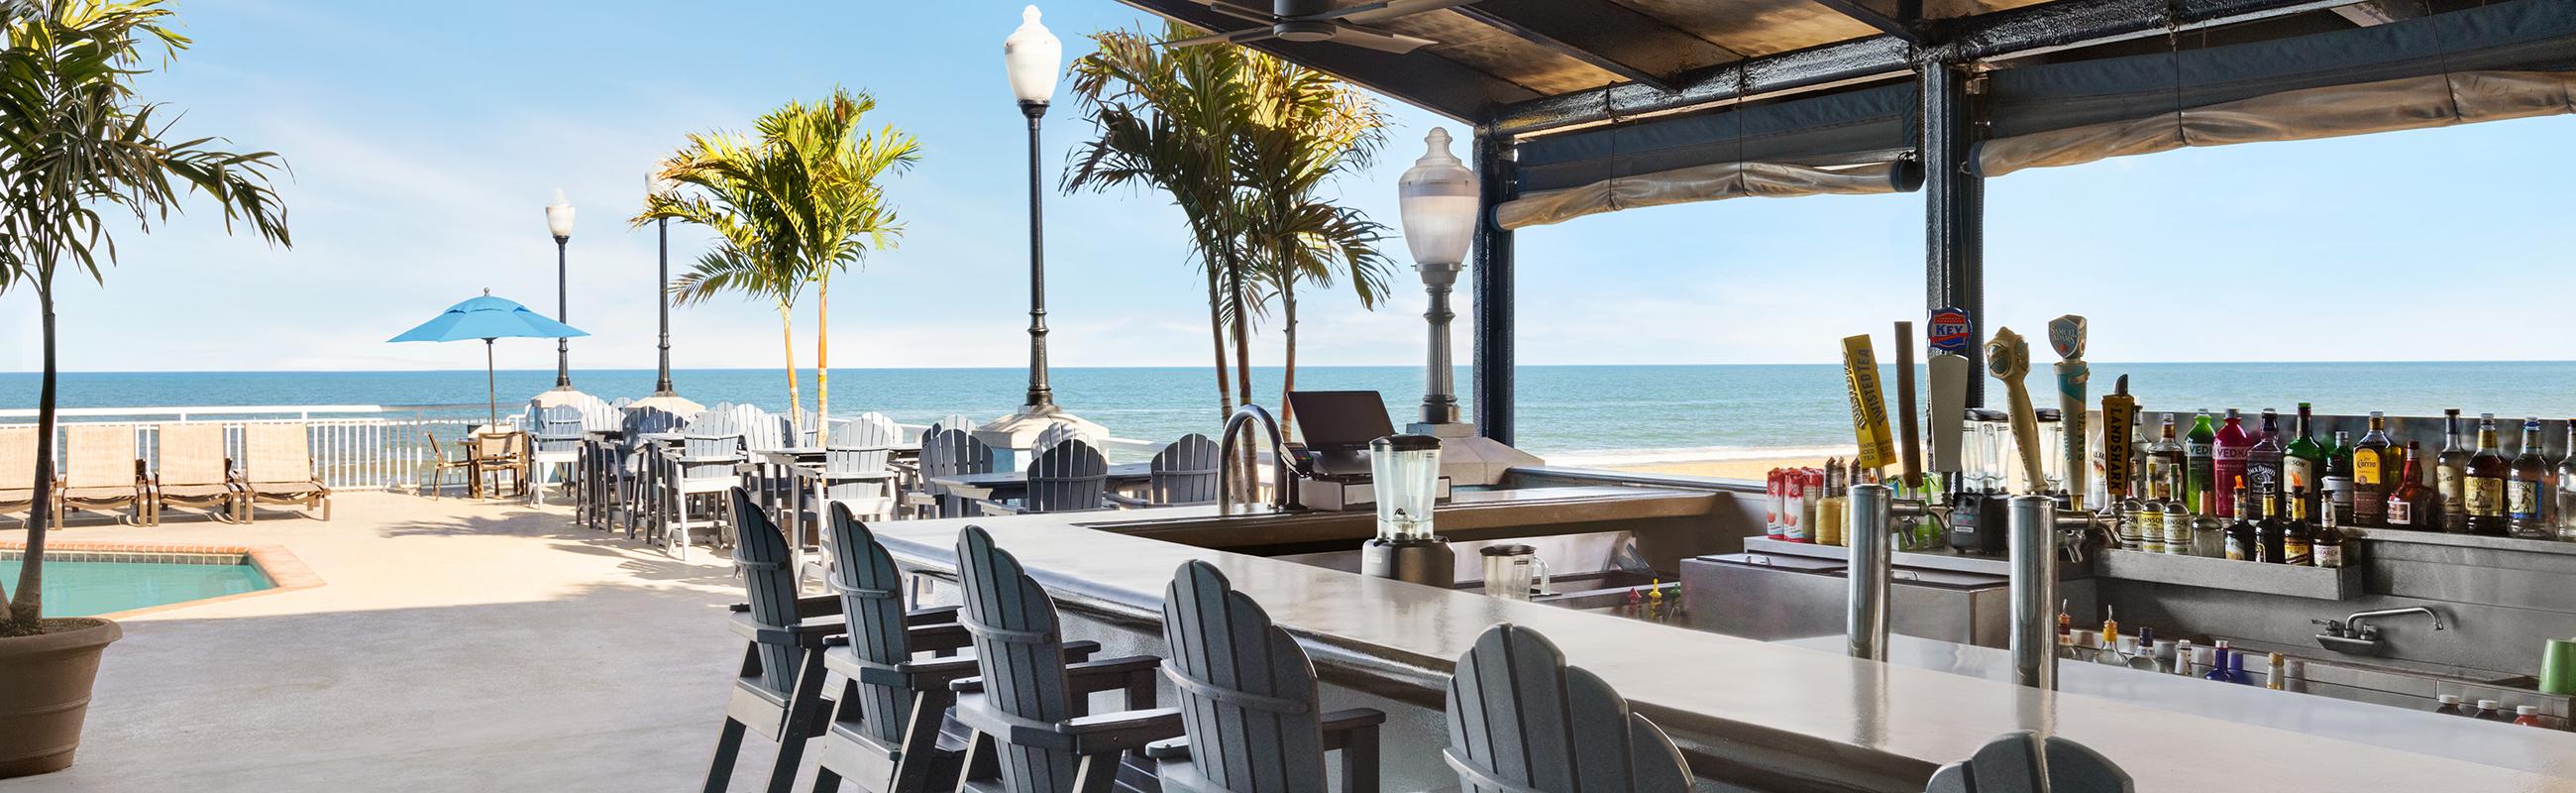 oceanfront dining in ocean city maryland